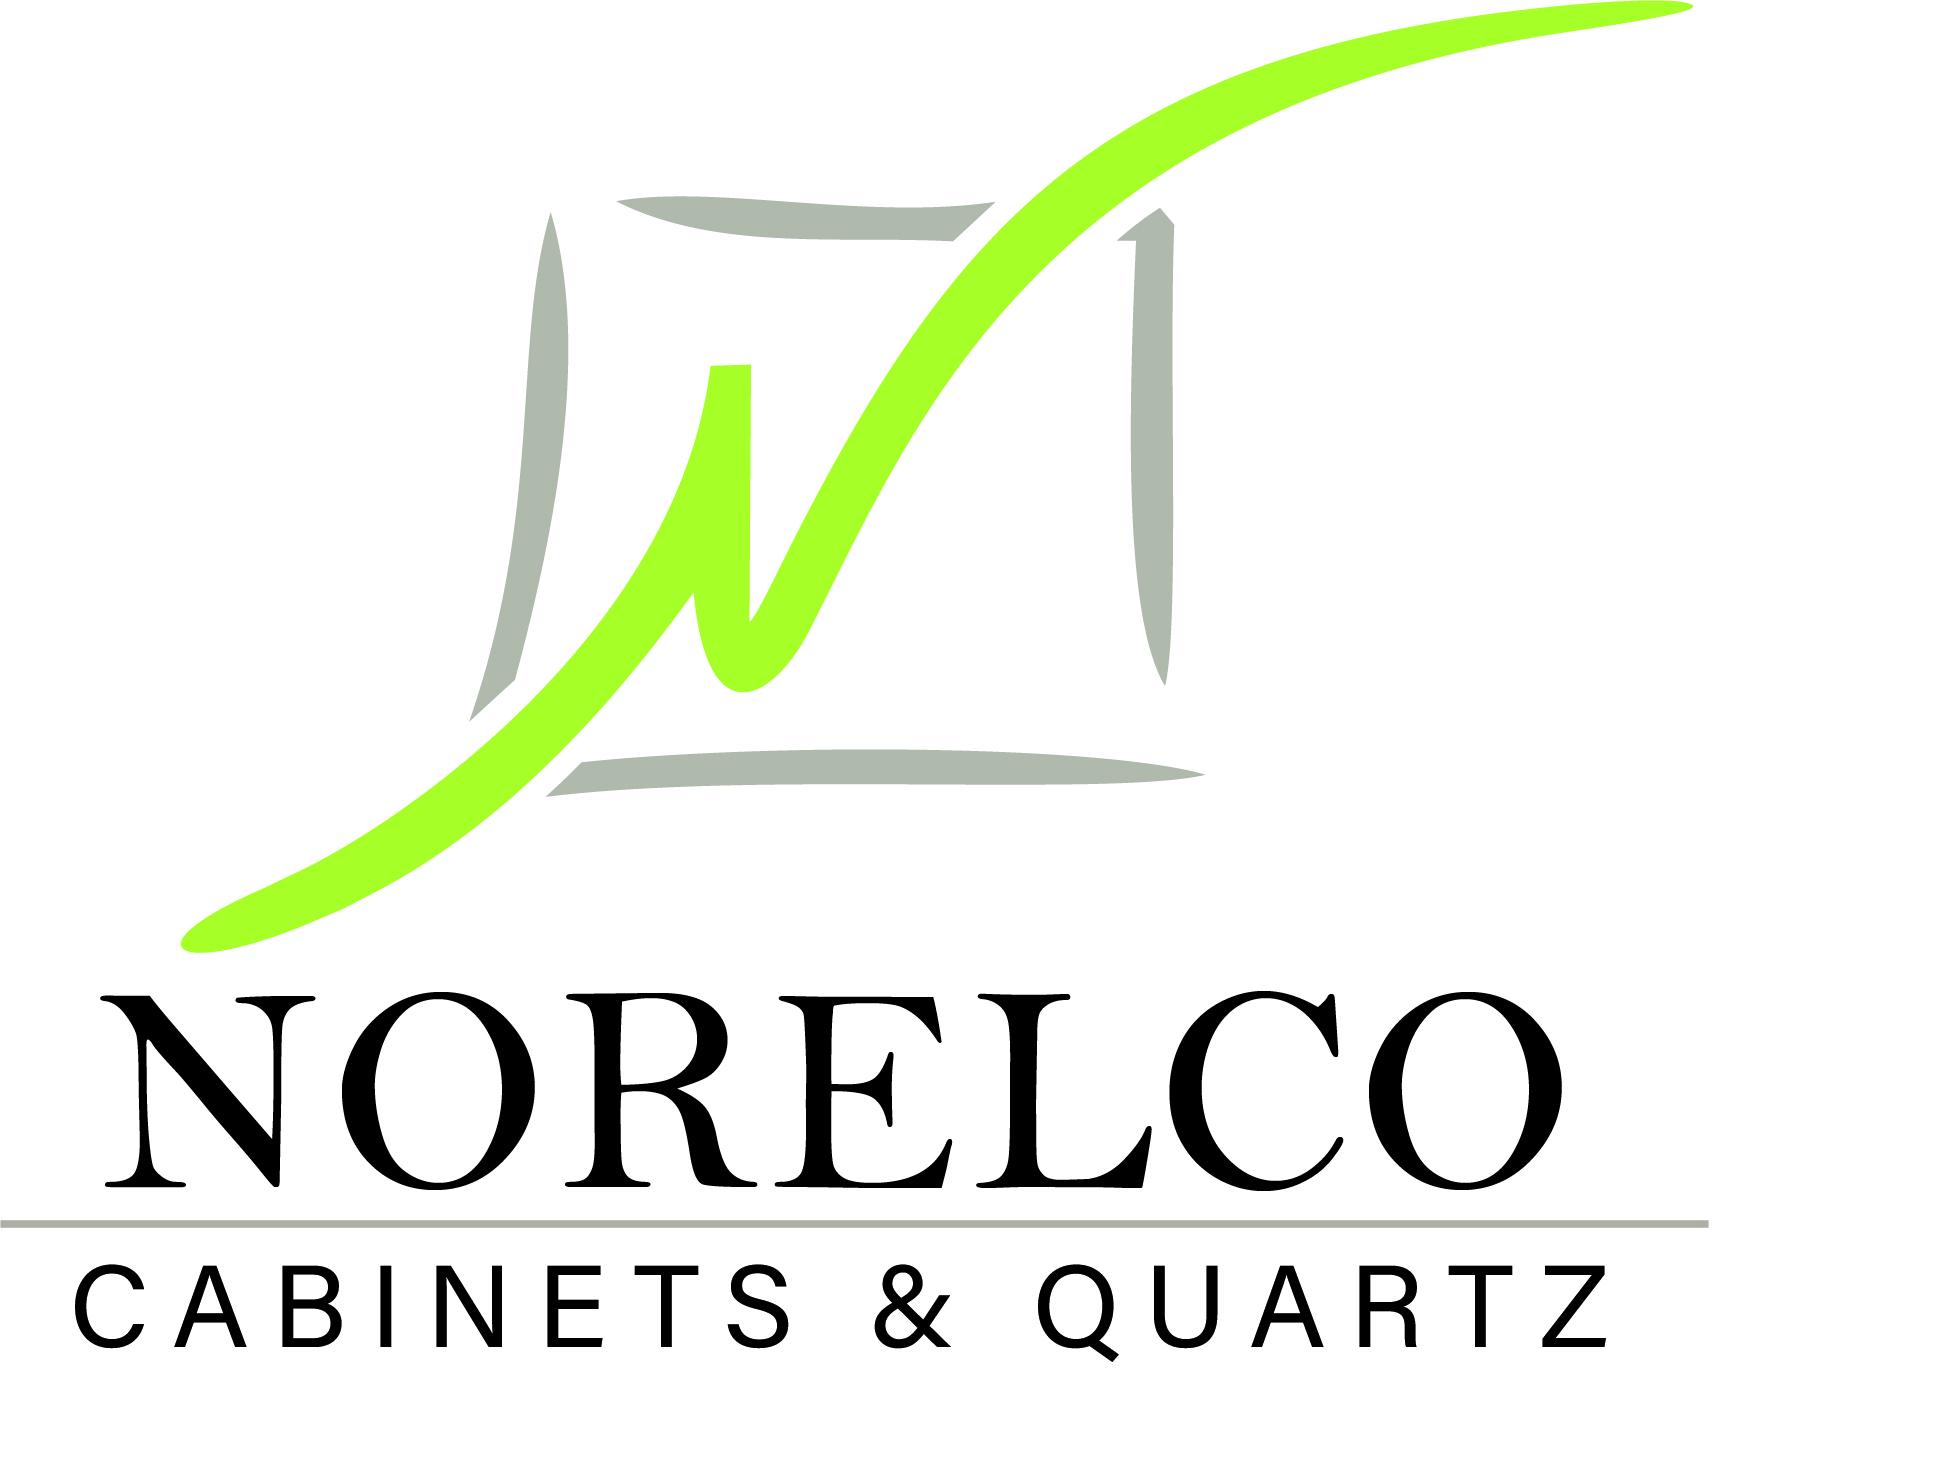 Norelco Cabinets Ltd logo